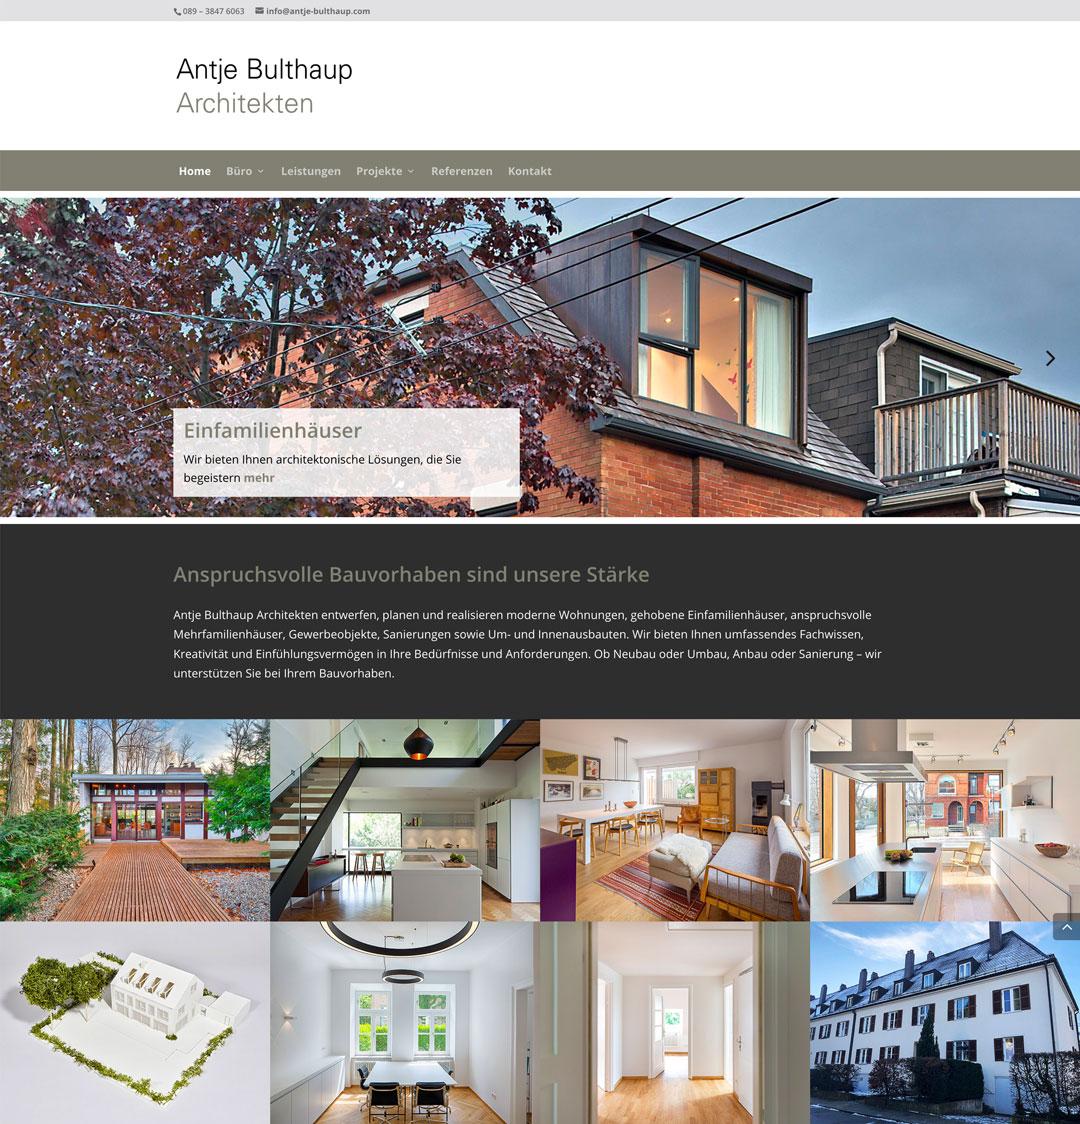 Antje Bulthaup Architekten: Website